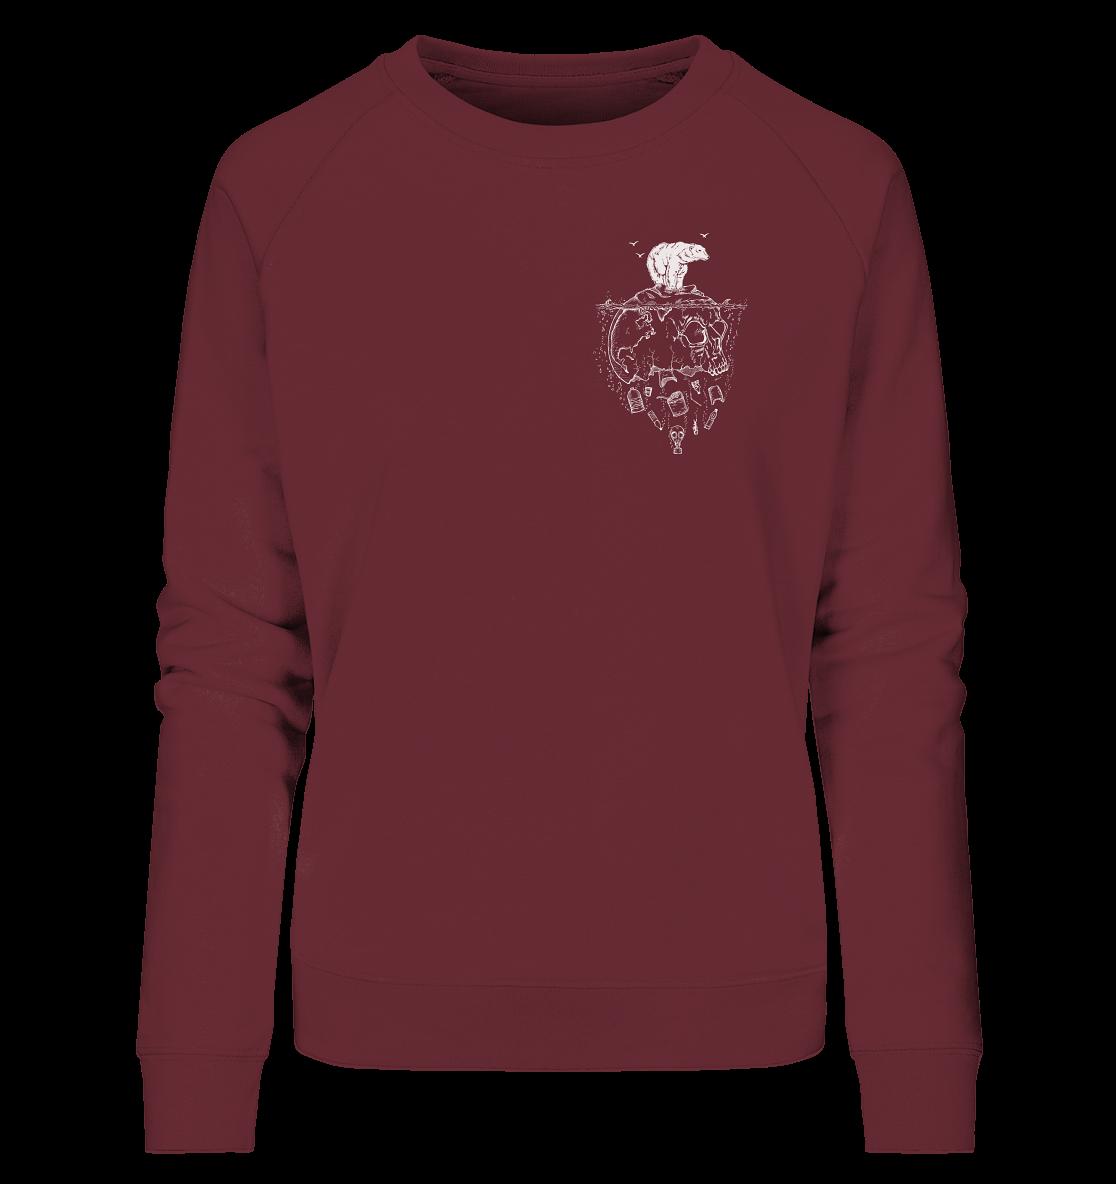 front-ladies-organic-sweatshirt-672b34-1116x-16.png